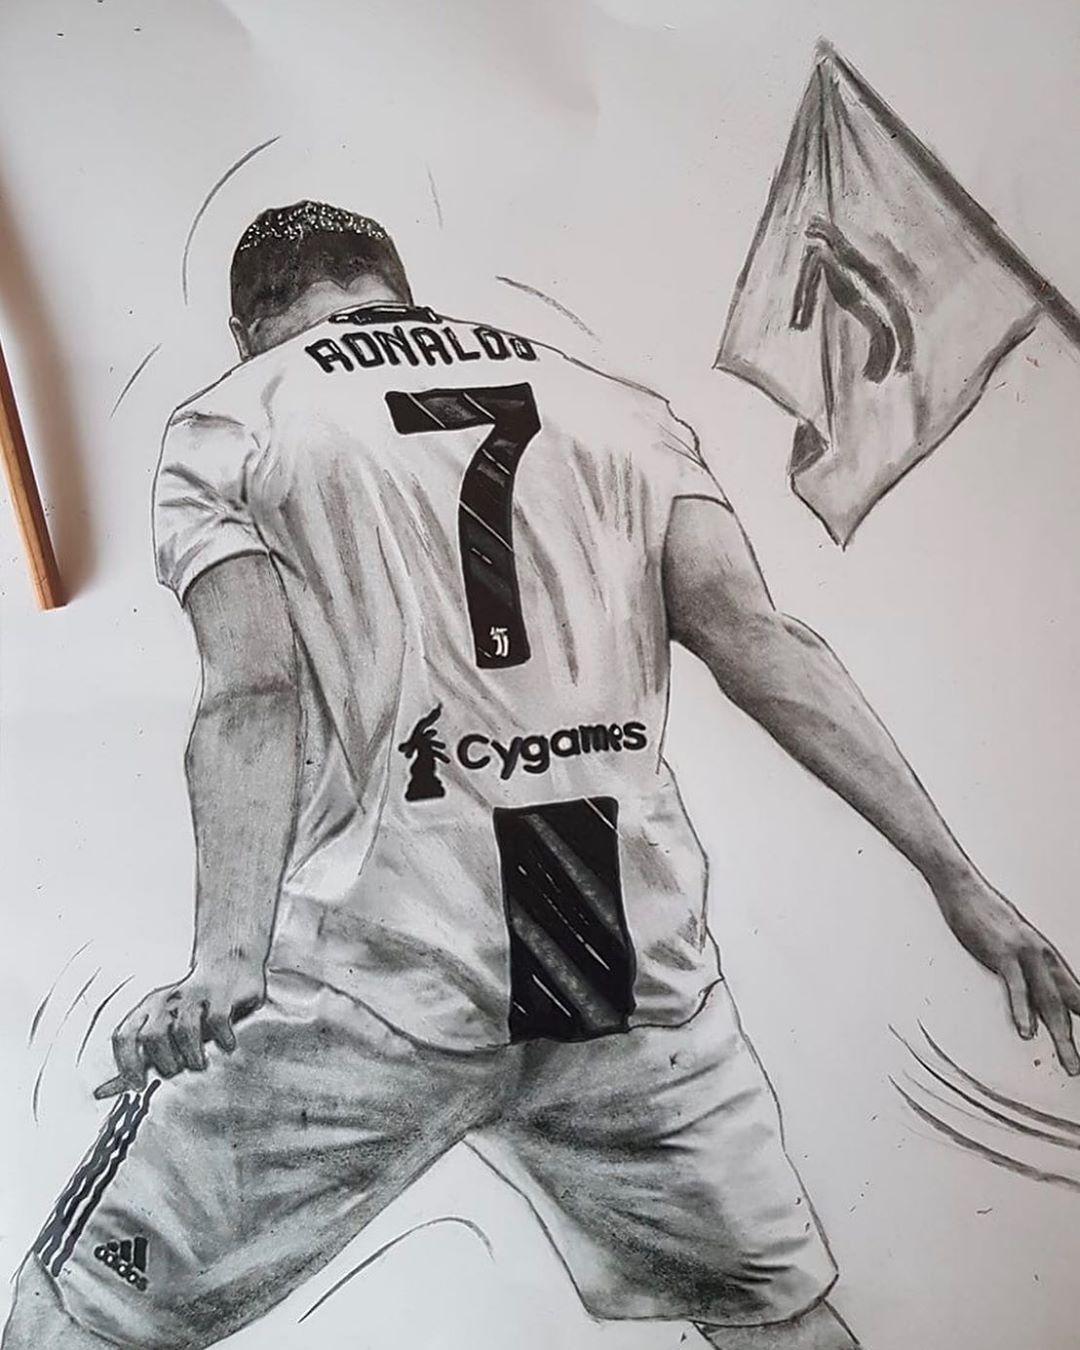 New The 10 Best Home Decor With Pictures Cristianoronaldo Juventus Fenomeno Bomber Storiadiungrandeamore Bla Pencil Drawings Ronaldo Cristiano Ronaldo